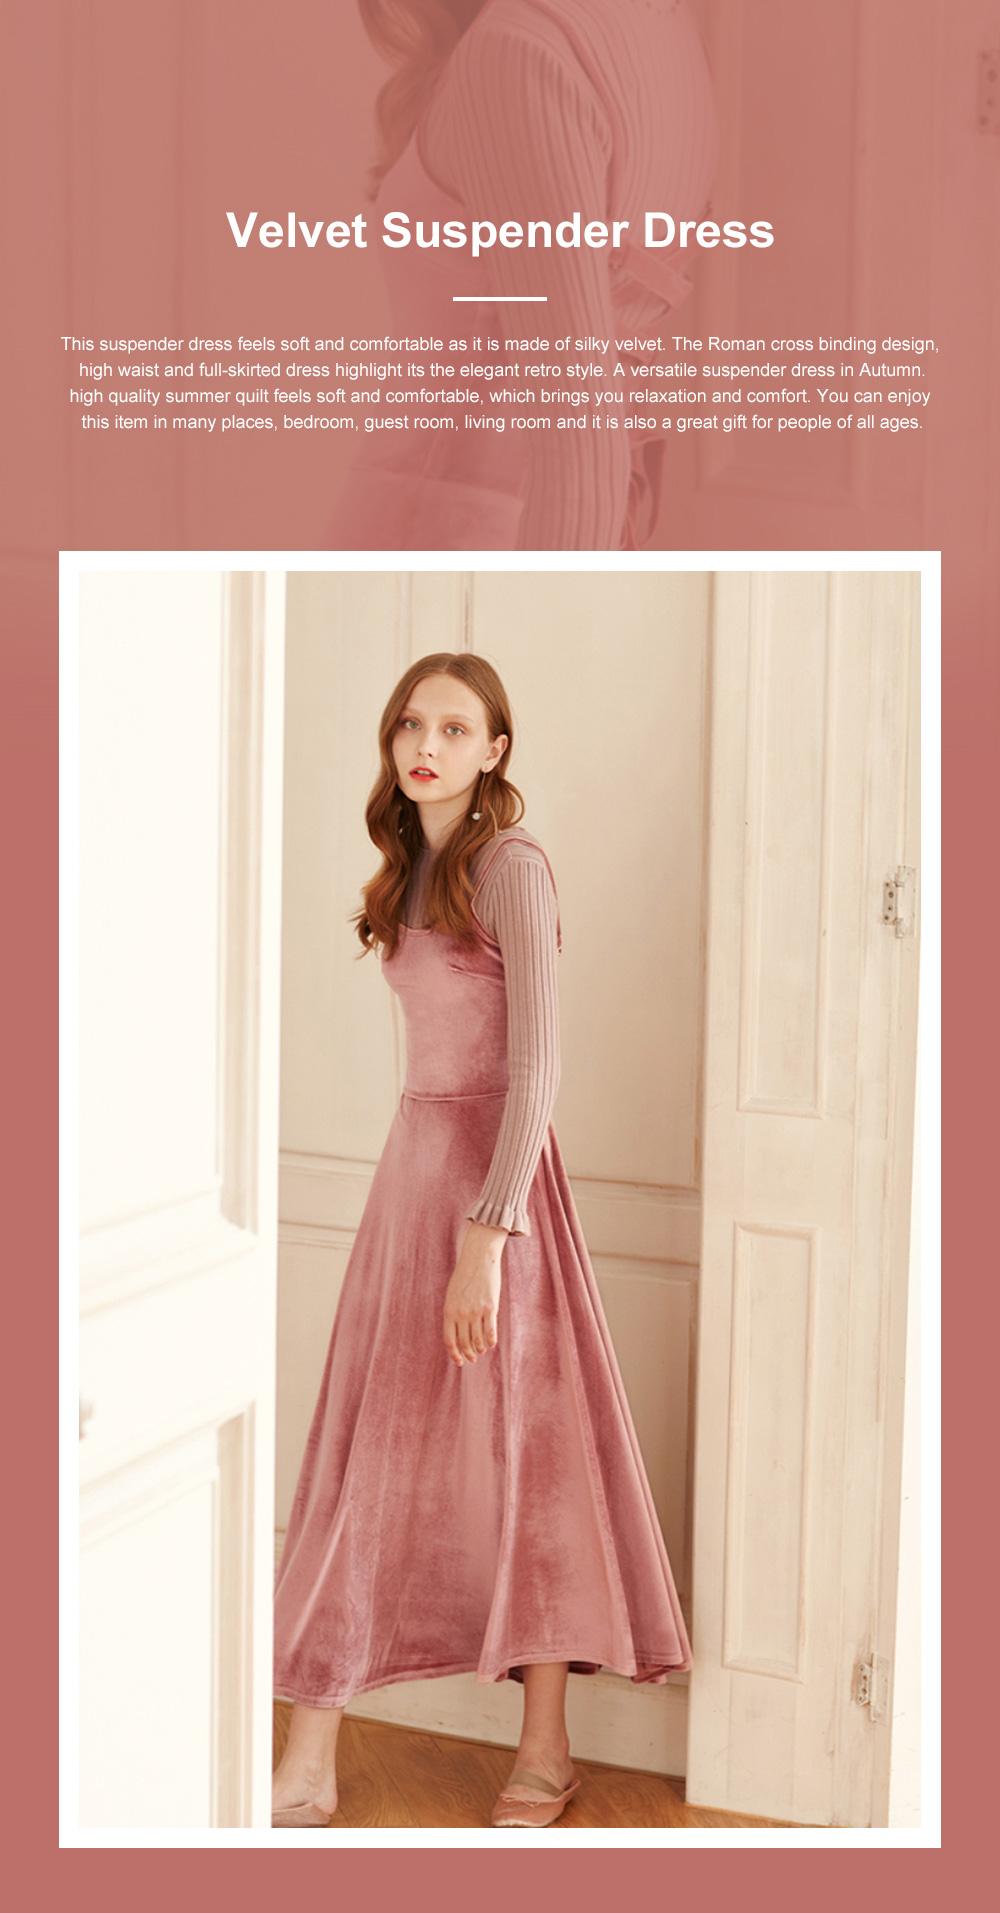 Women's Overall Suspender Dress Velvet Classic Retro Style with High Waist and Back Strap Ankle Length Bottoming Vest Skirt 0